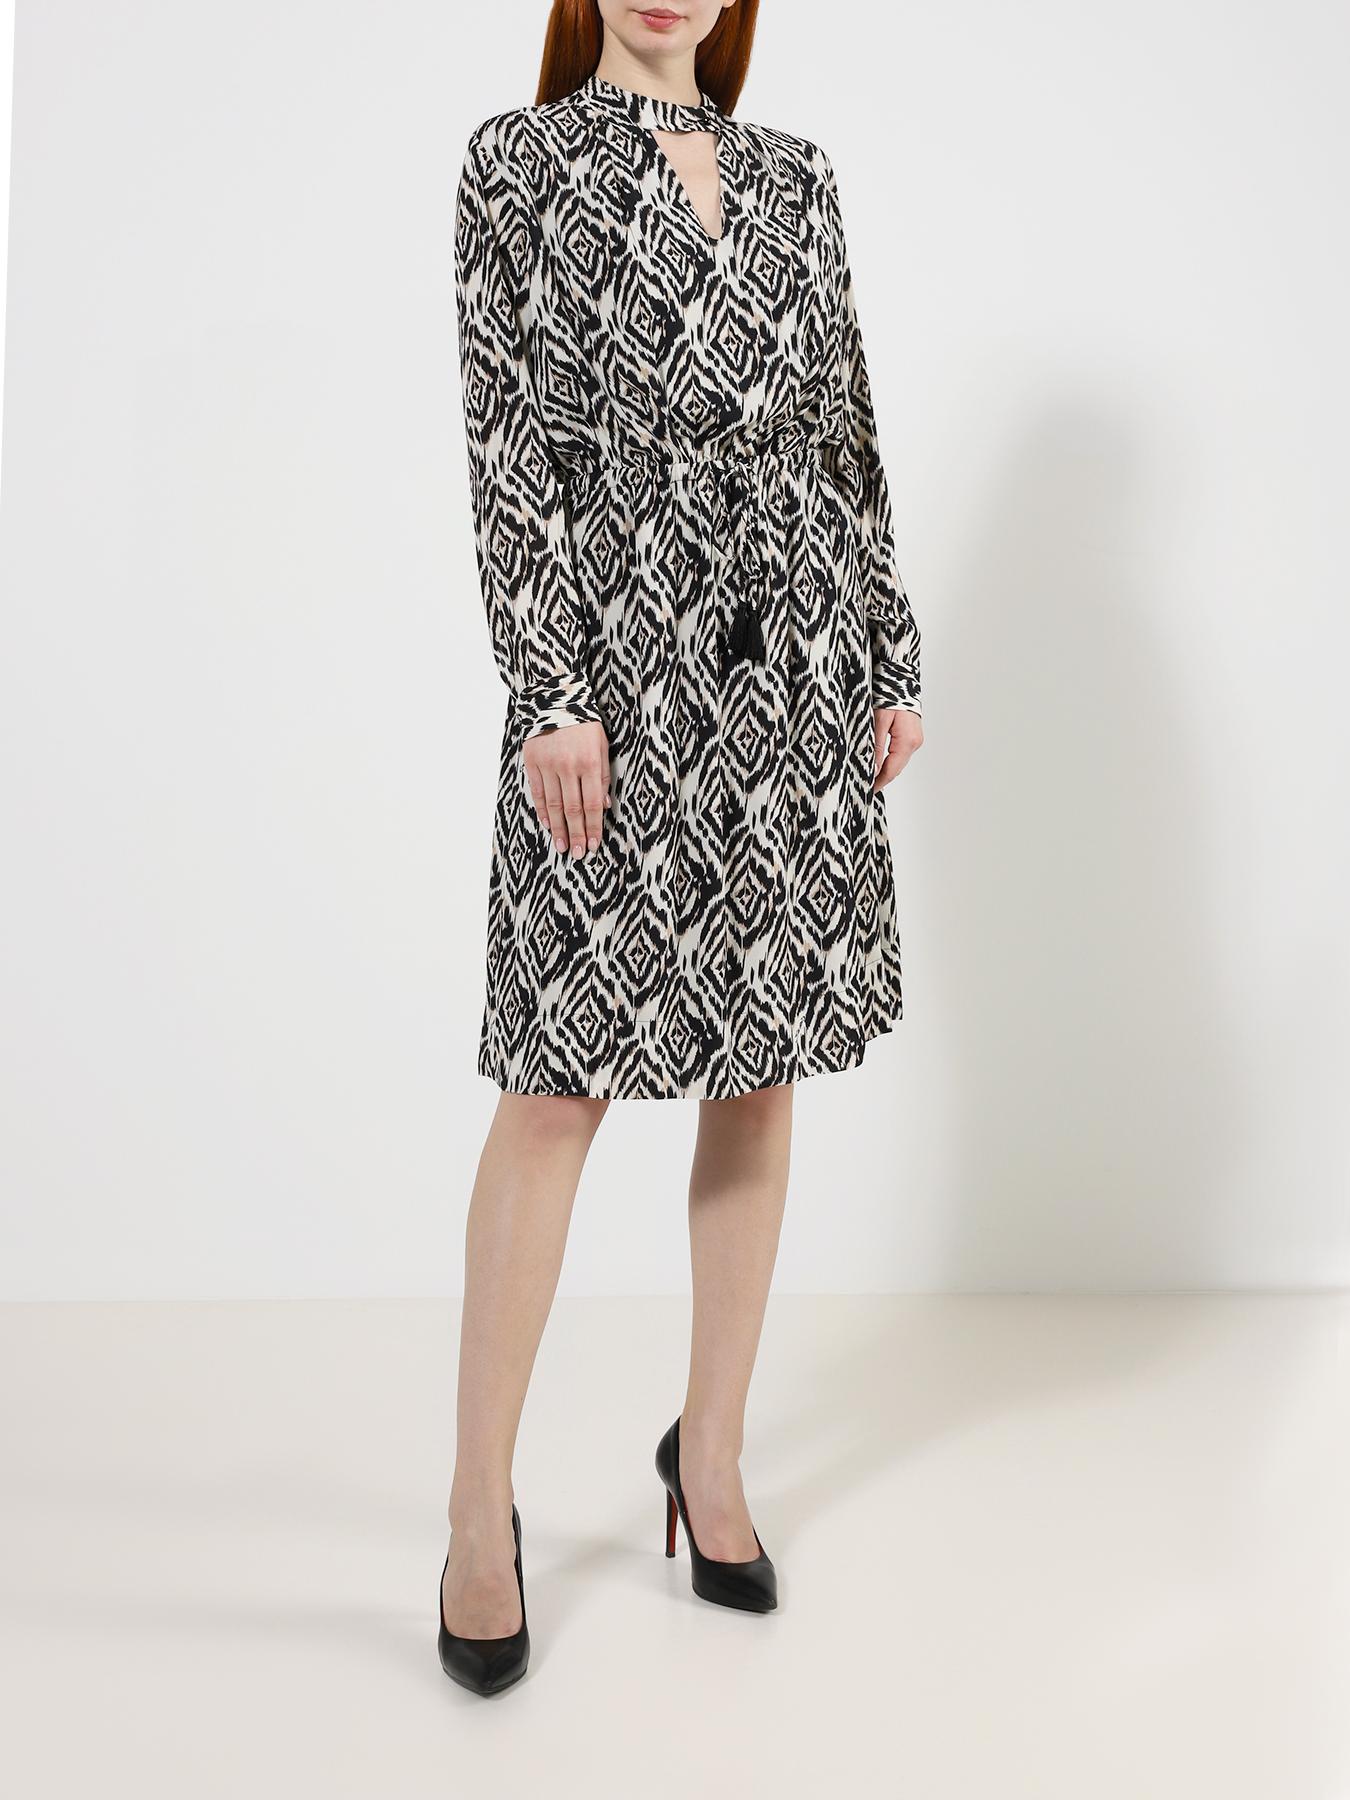 Платье Seventy Платье платье svesta svesta mp002xw1hsd2